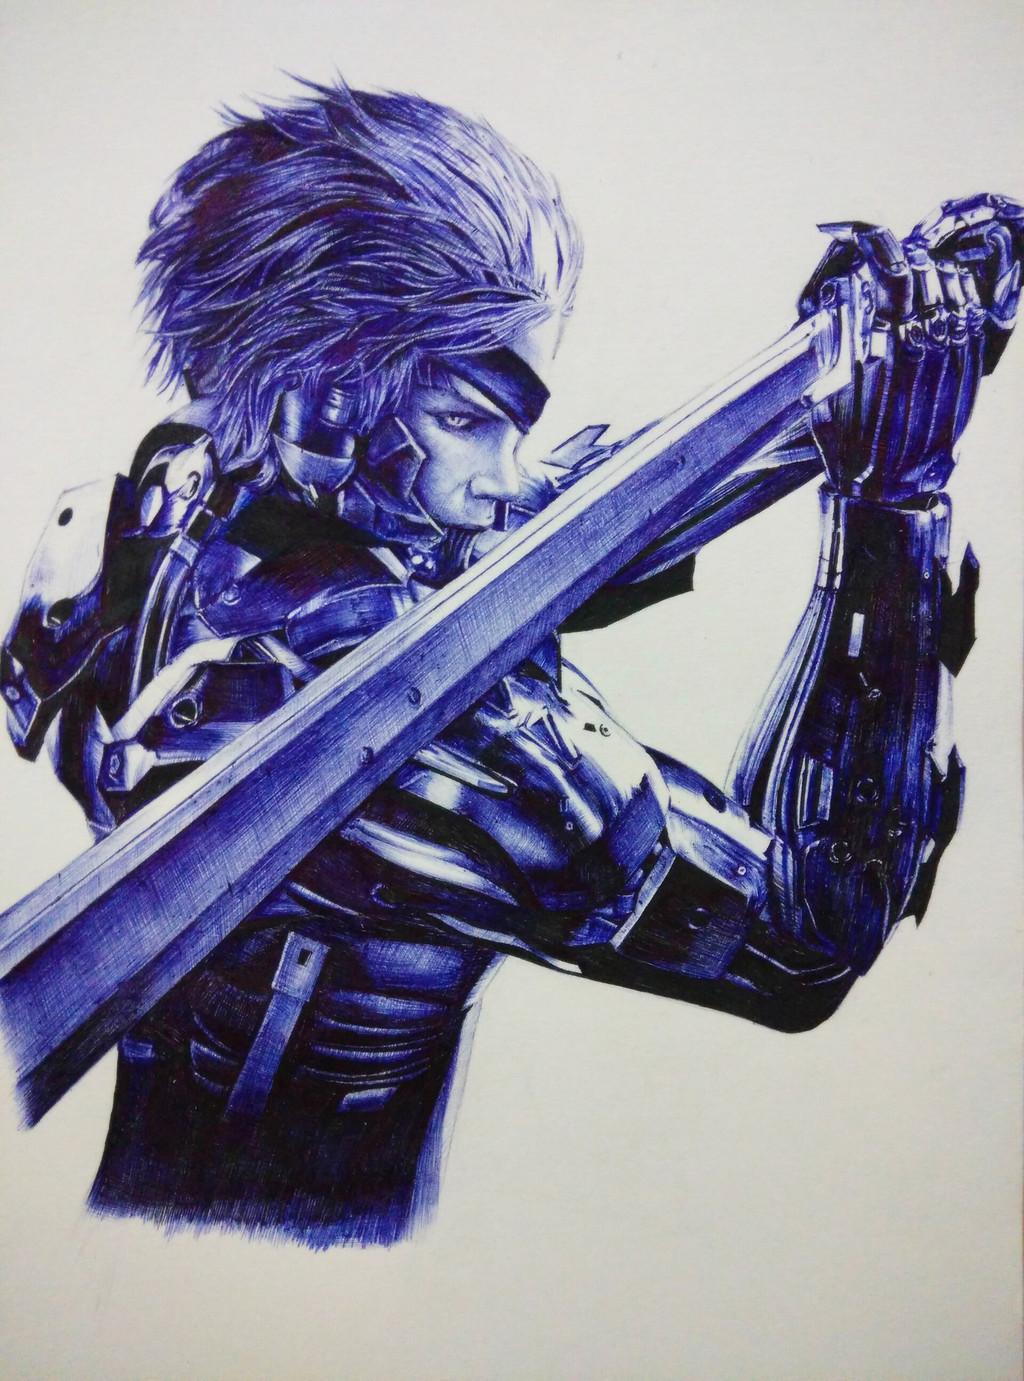 Most recent image: Metal Gear Rising Revengeance